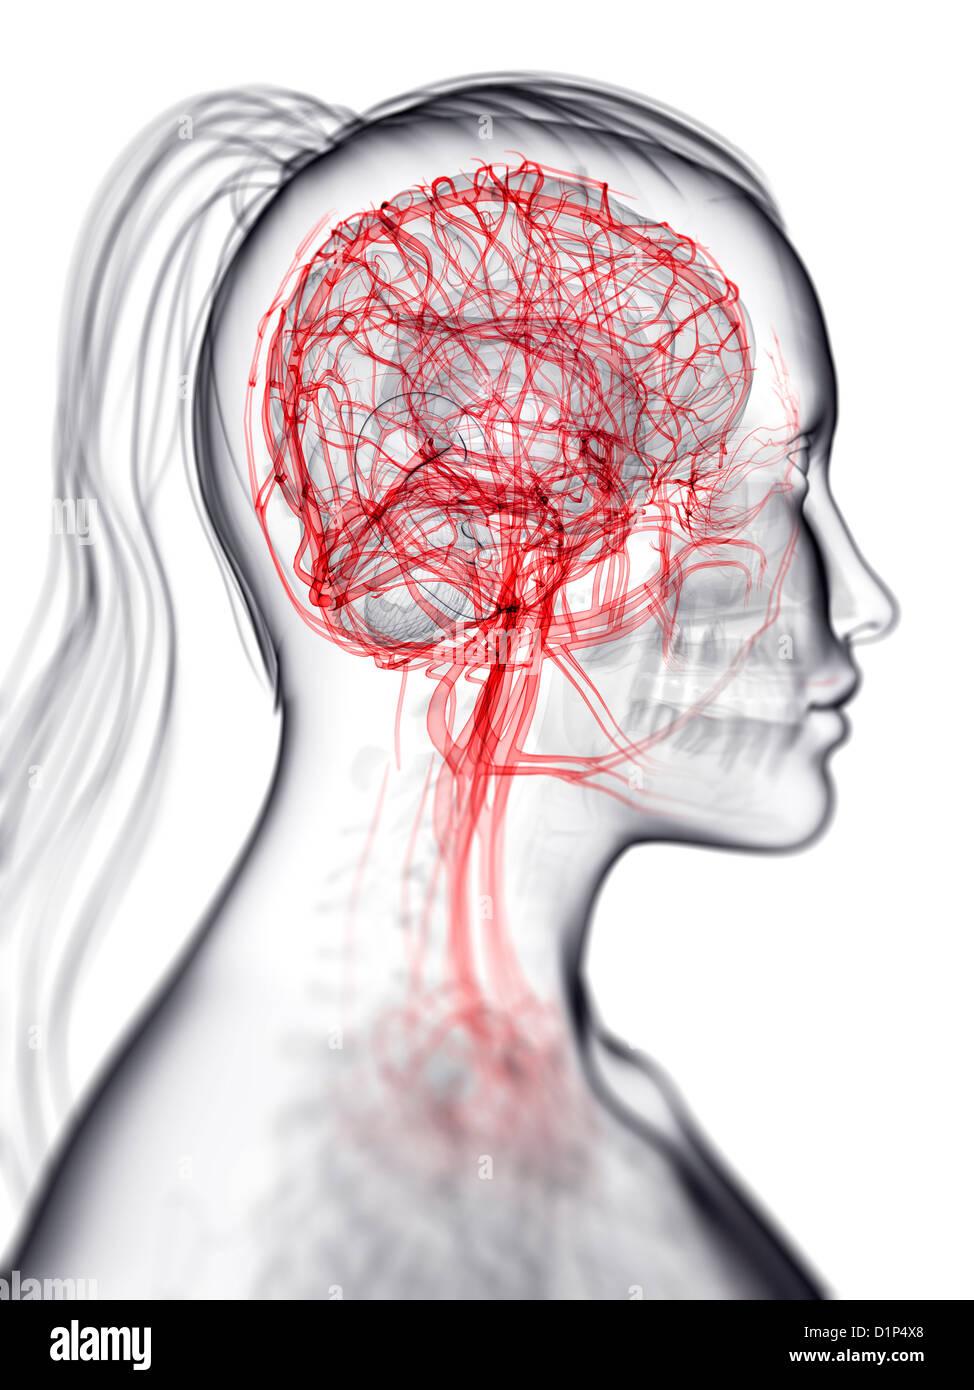 Brains Anatomy Imágenes De Stock & Brains Anatomy Fotos De Stock - Alamy